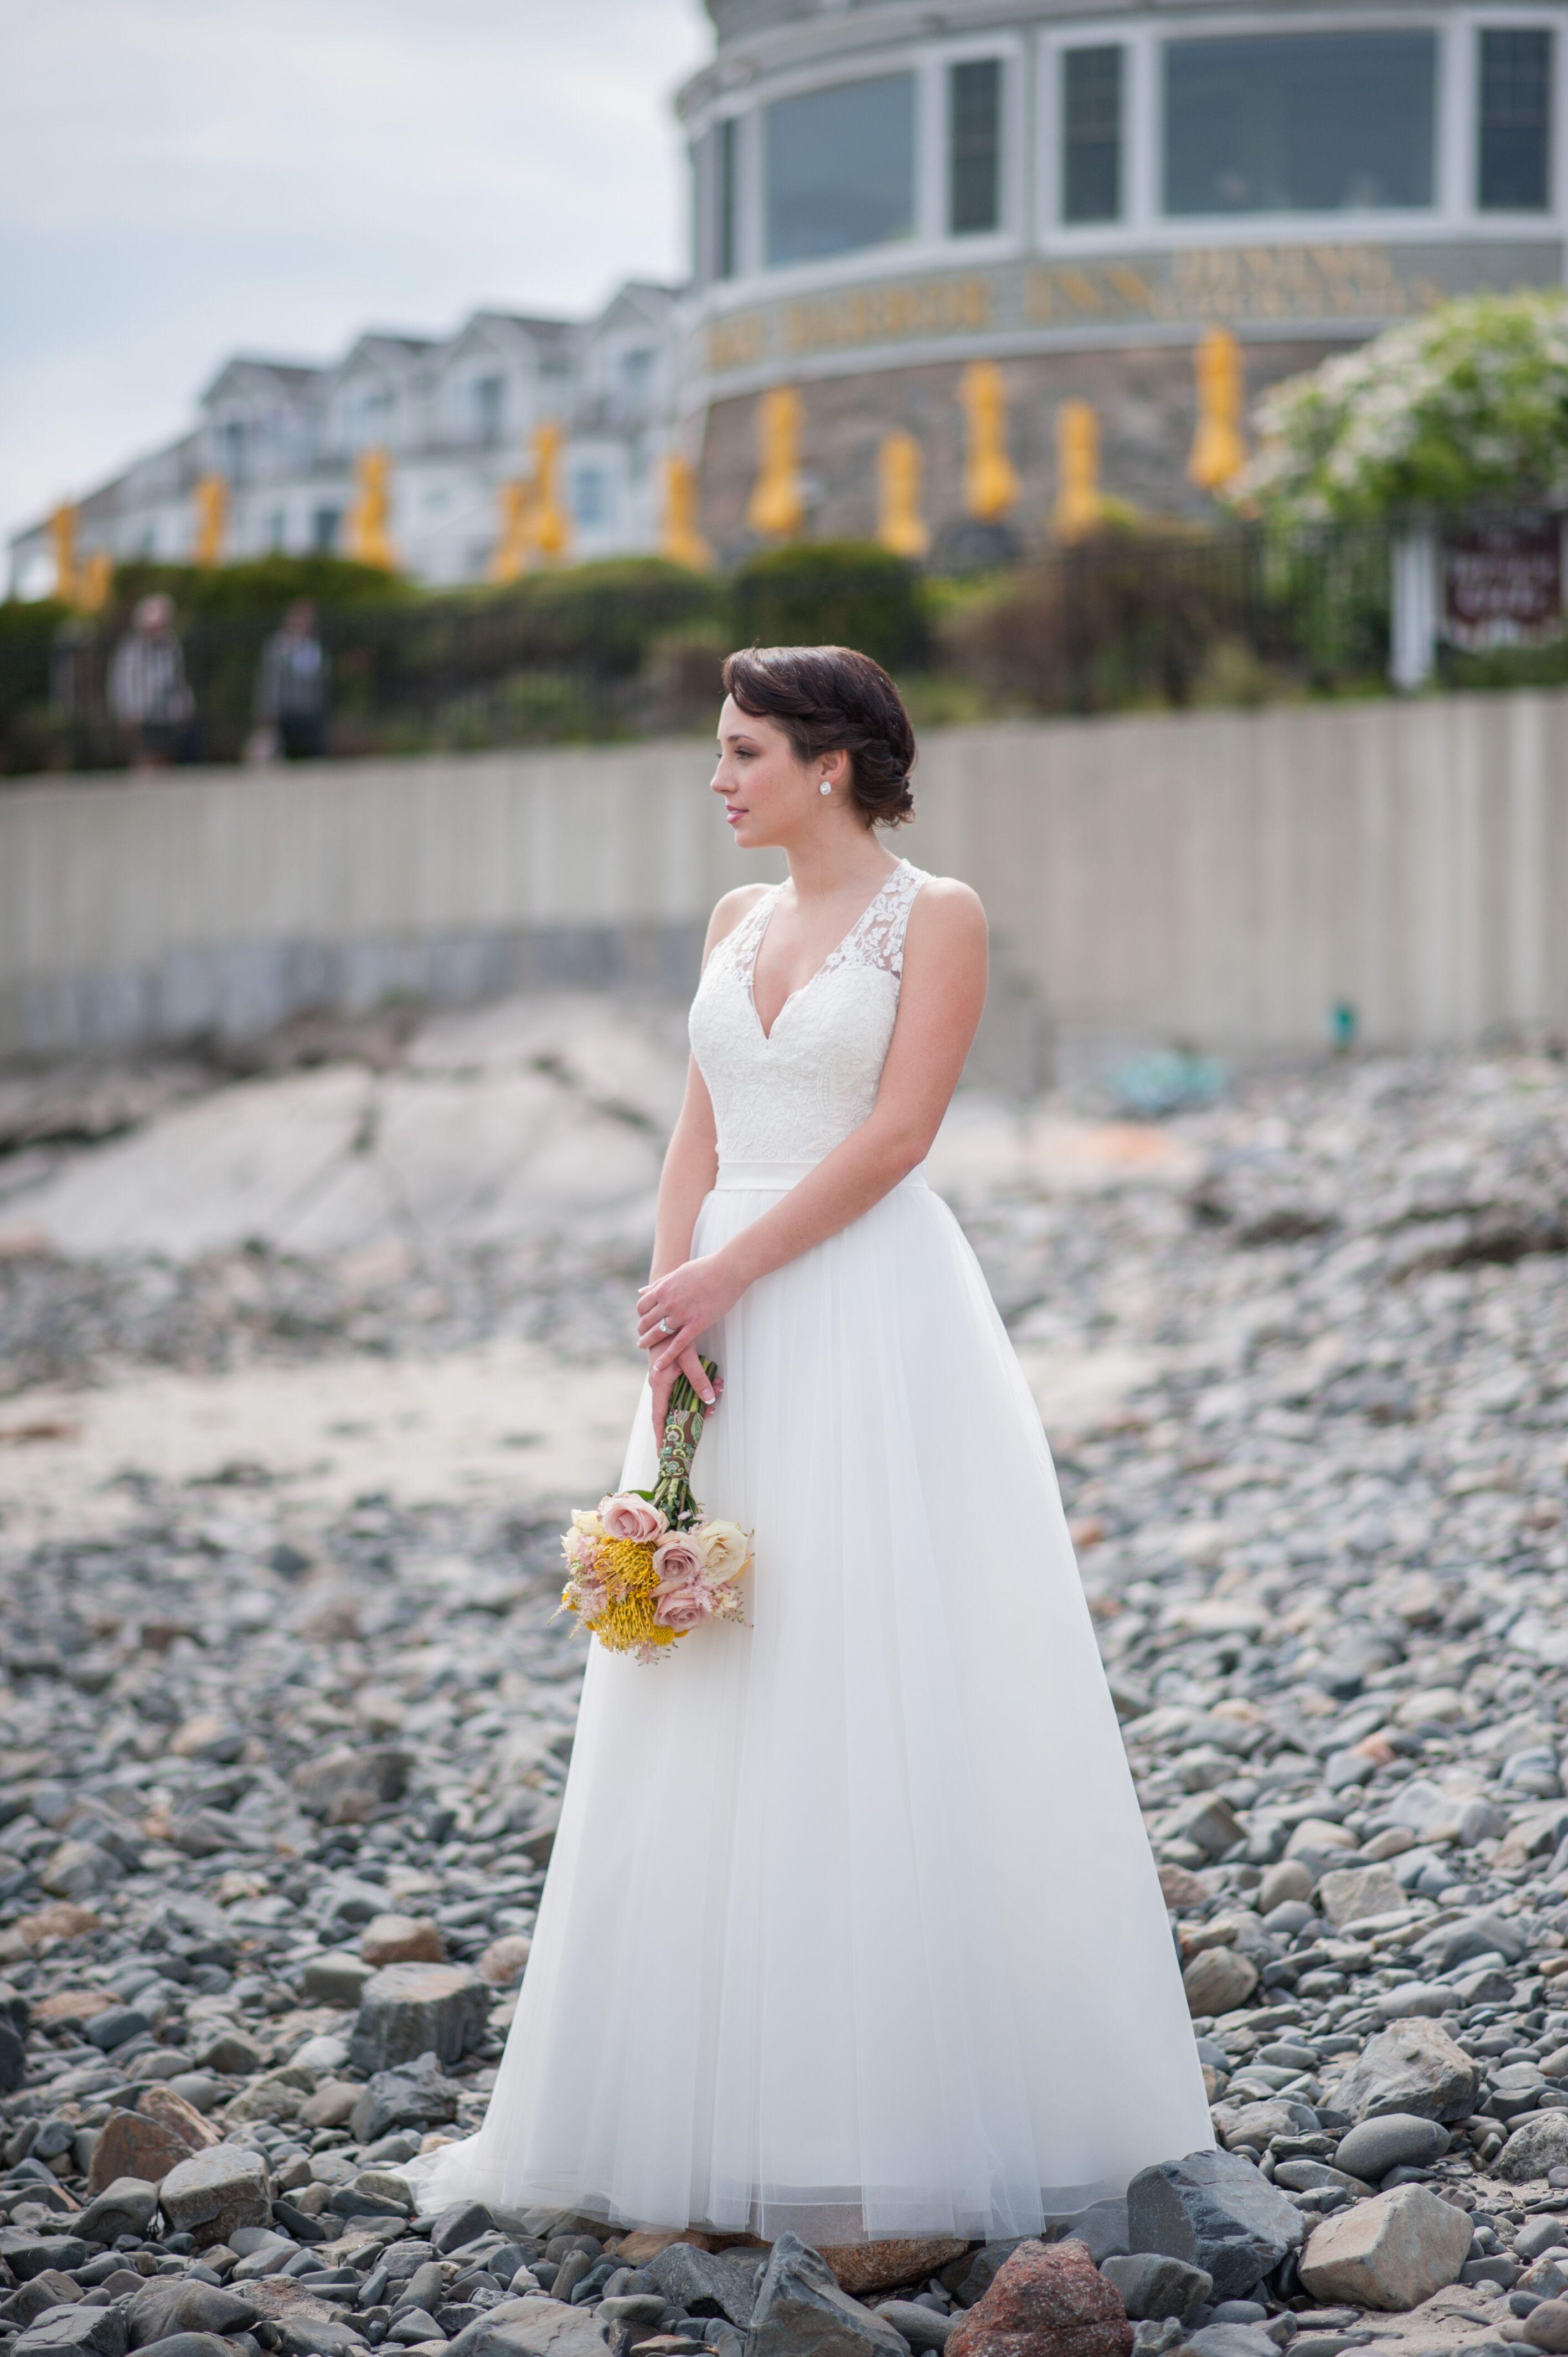 c21ef786236d Blush Bridal & Formal | Presque Isle | Bridal Salons - Presque Isle, ME